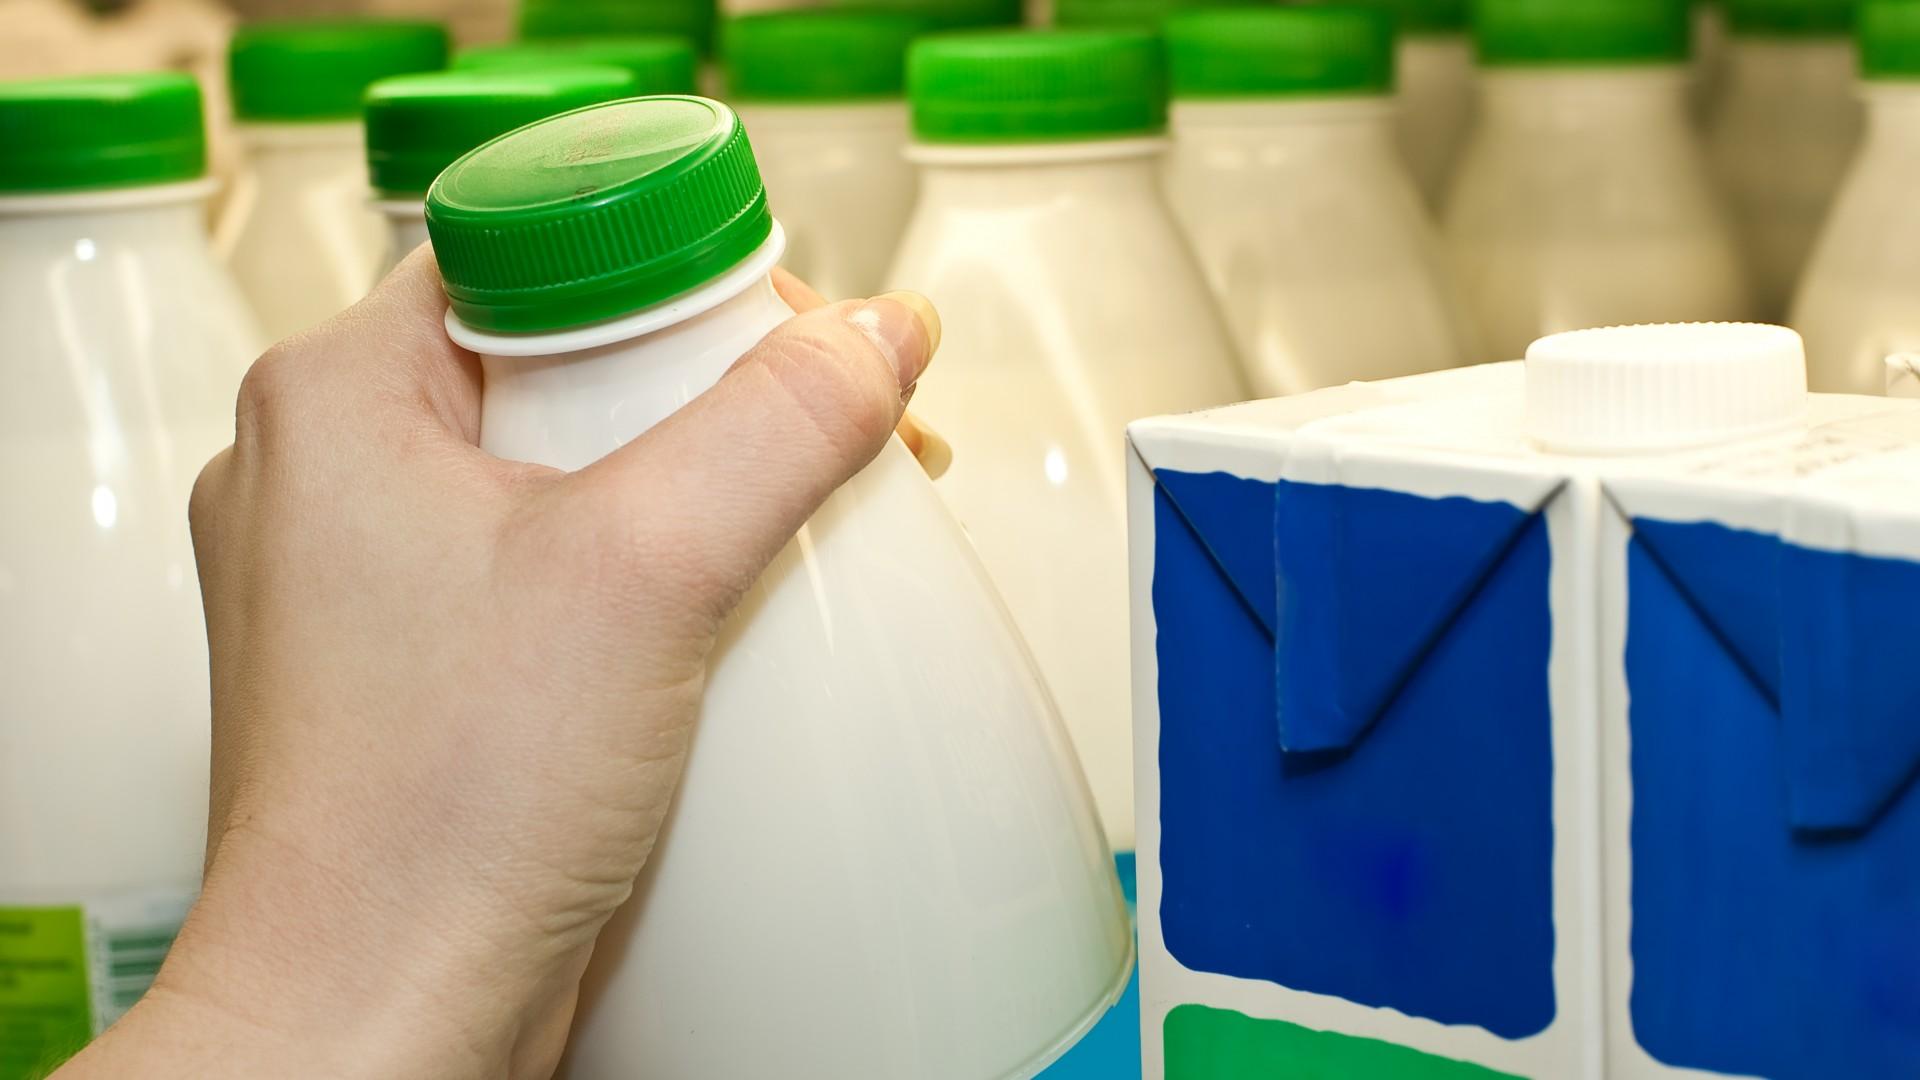 pulling-milk-botle-from-store-supermarket-shelf